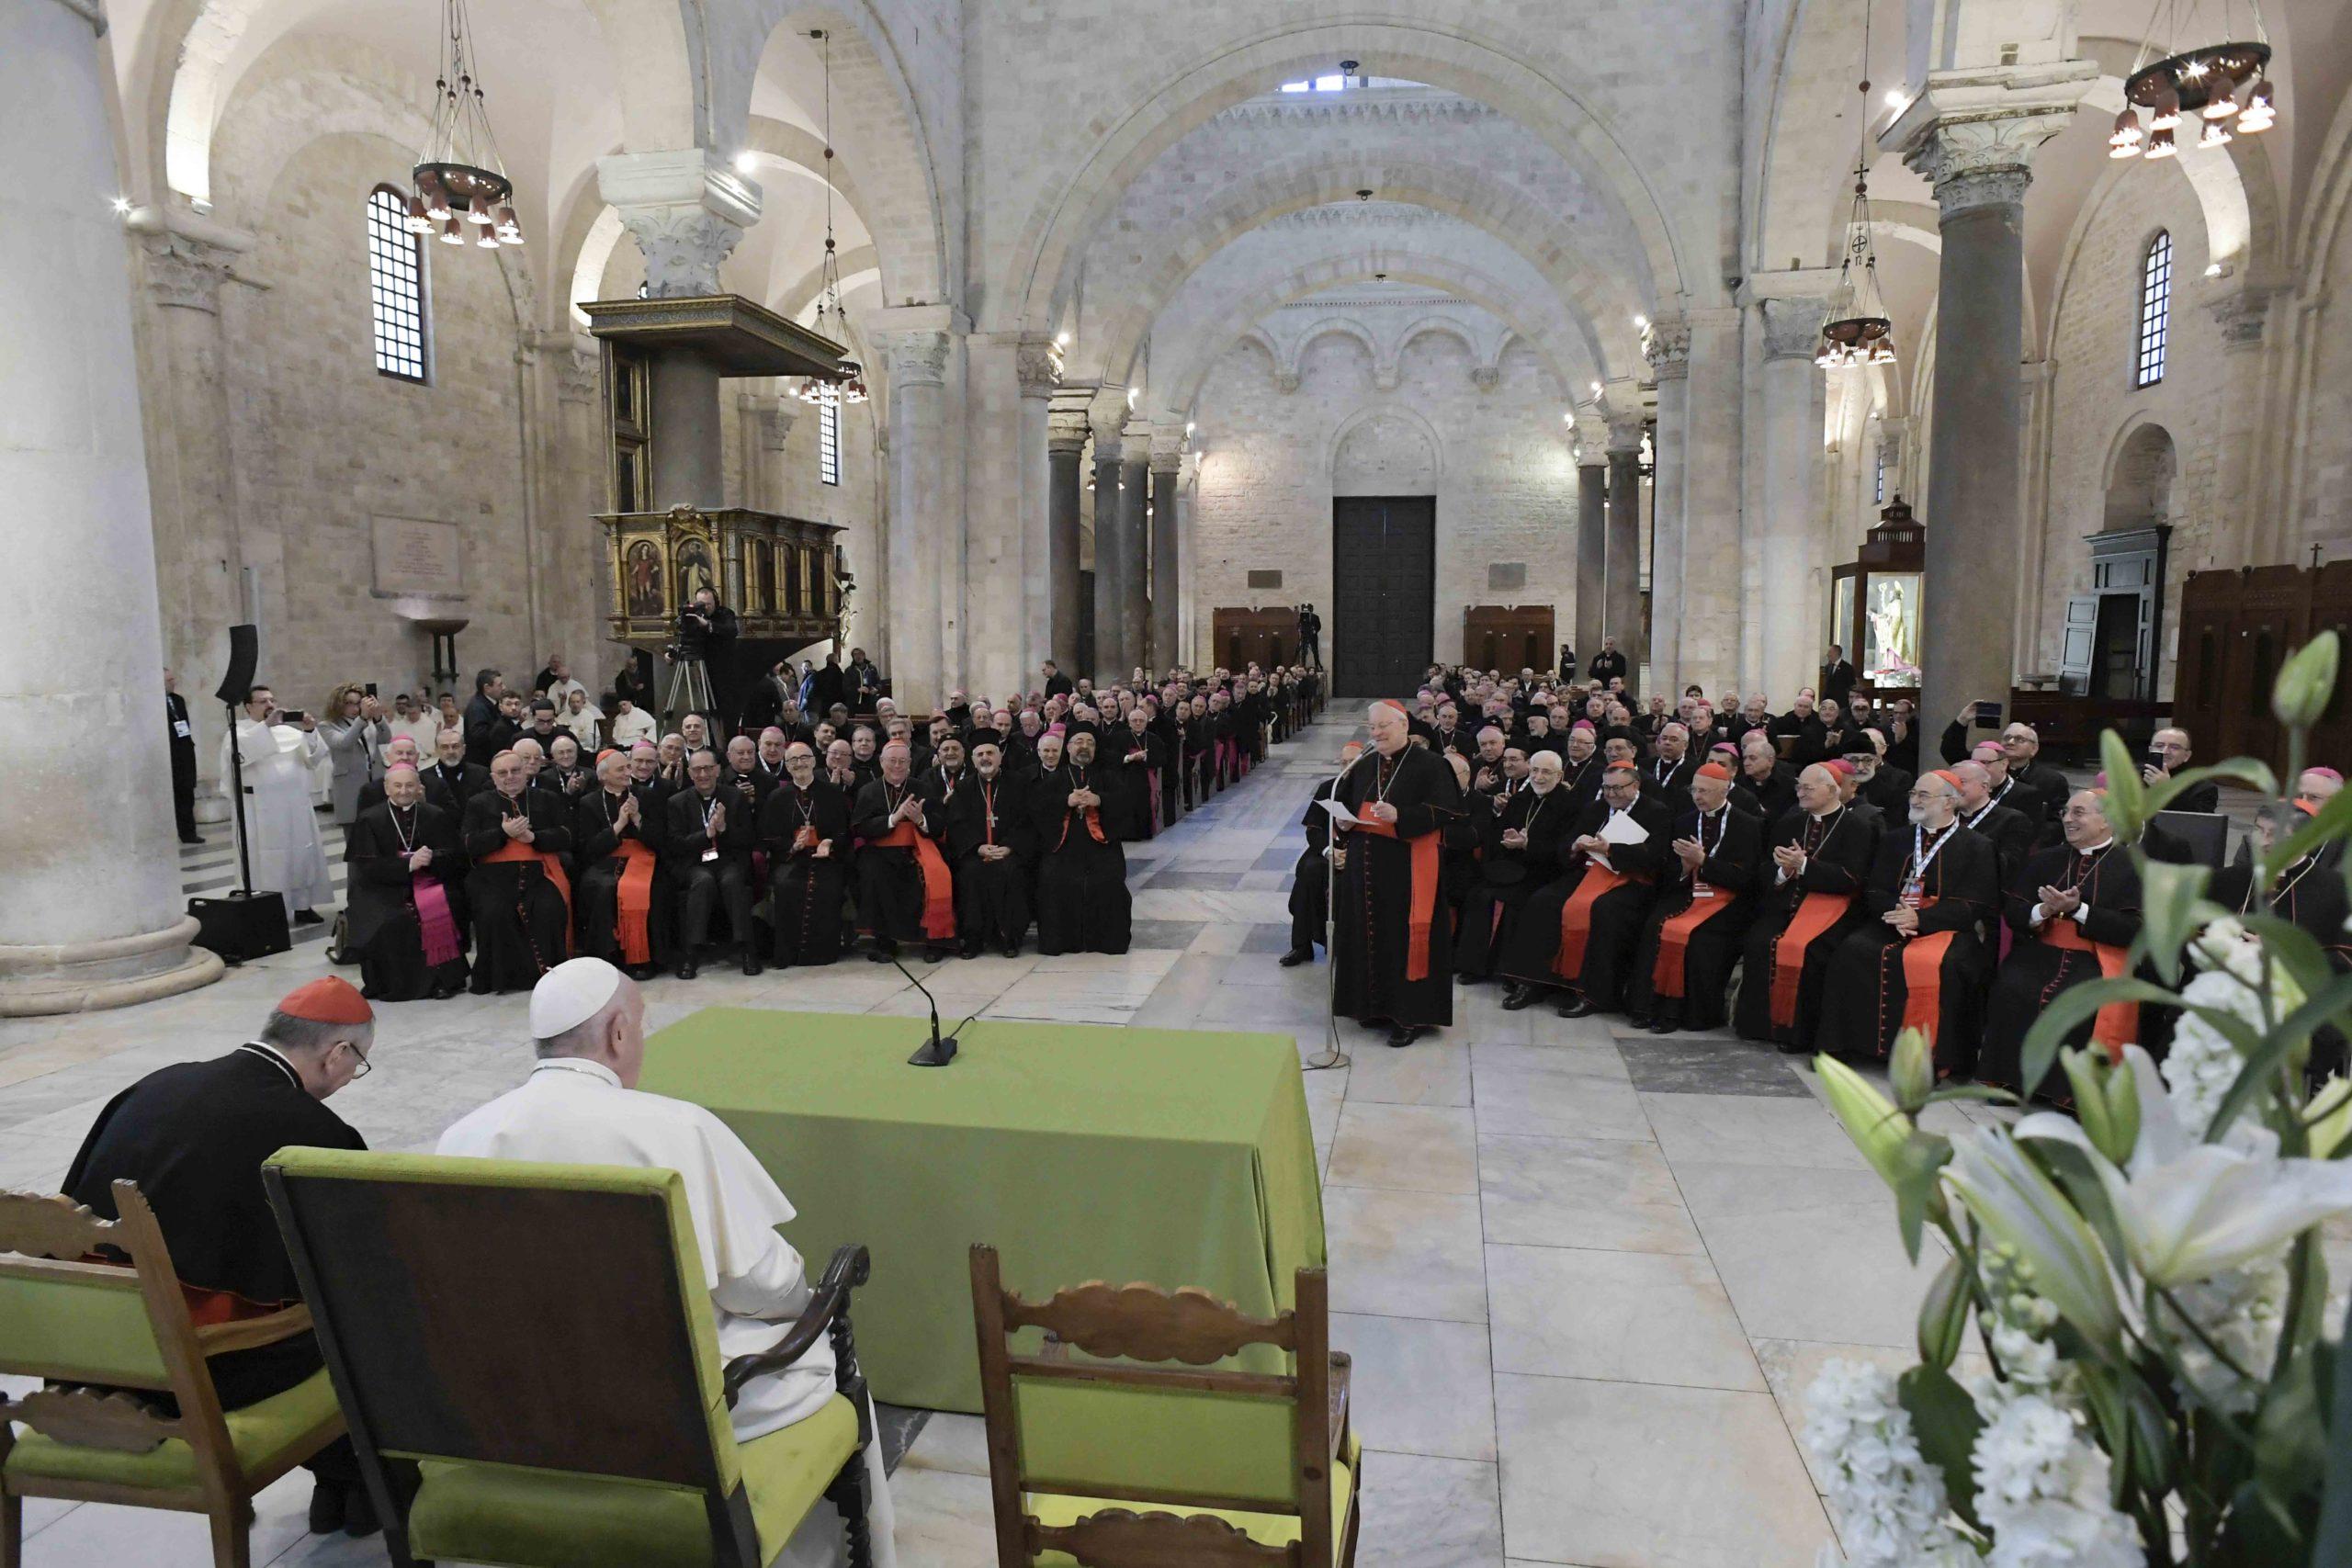 Rencontre avec les évêques de la Méditerranée à Bari, 23 février 2020 © Vatican Media